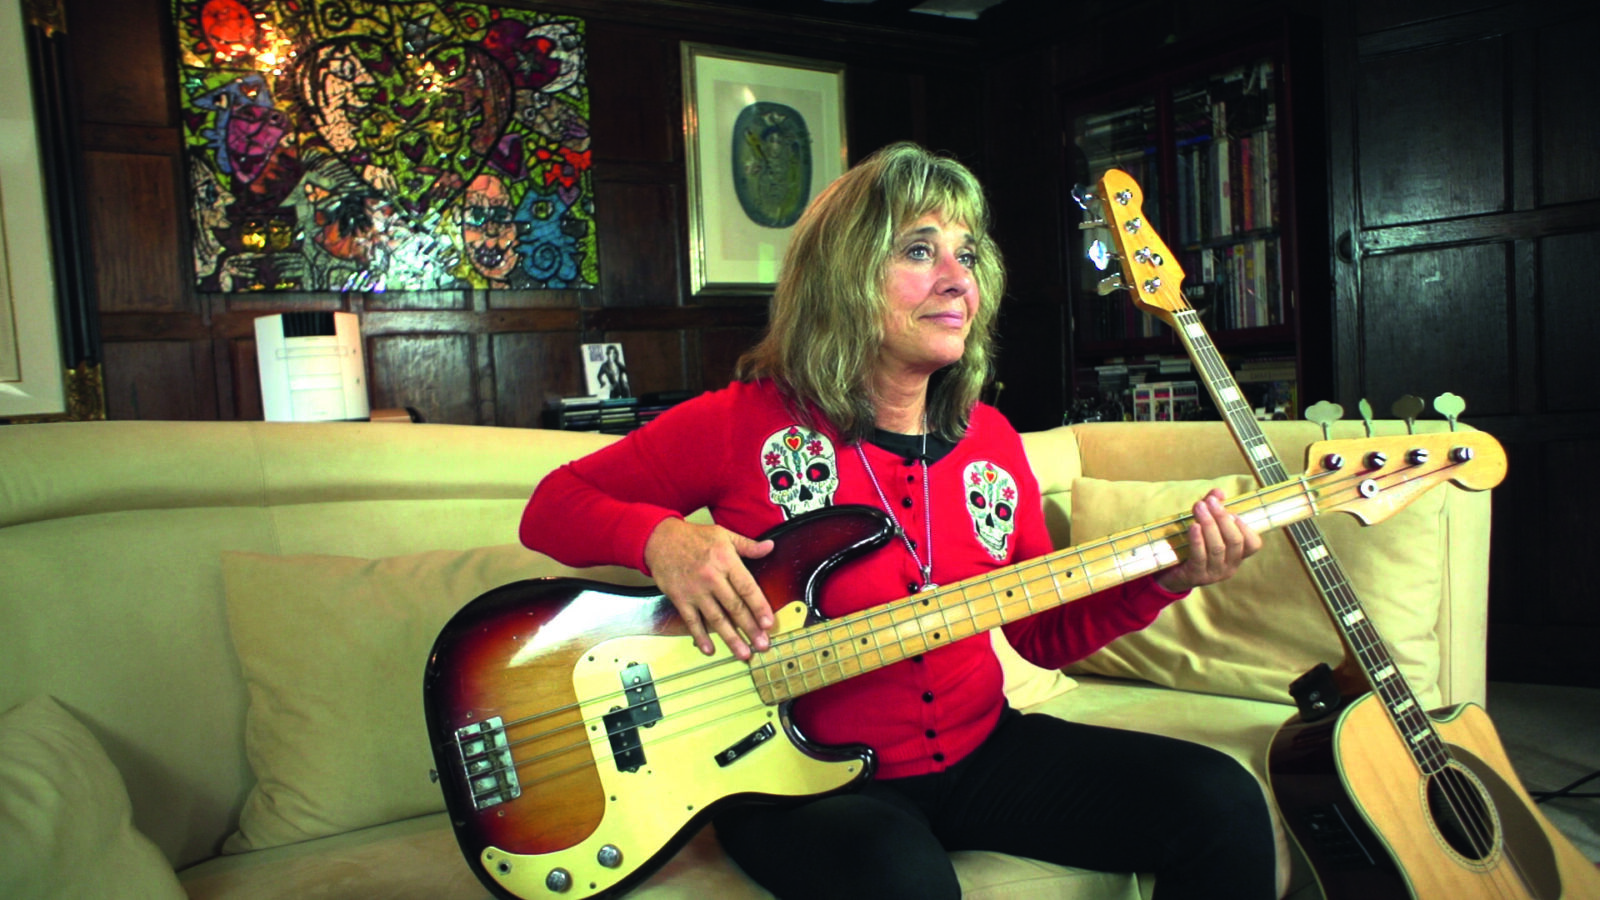 Suzi at home P Bass HR